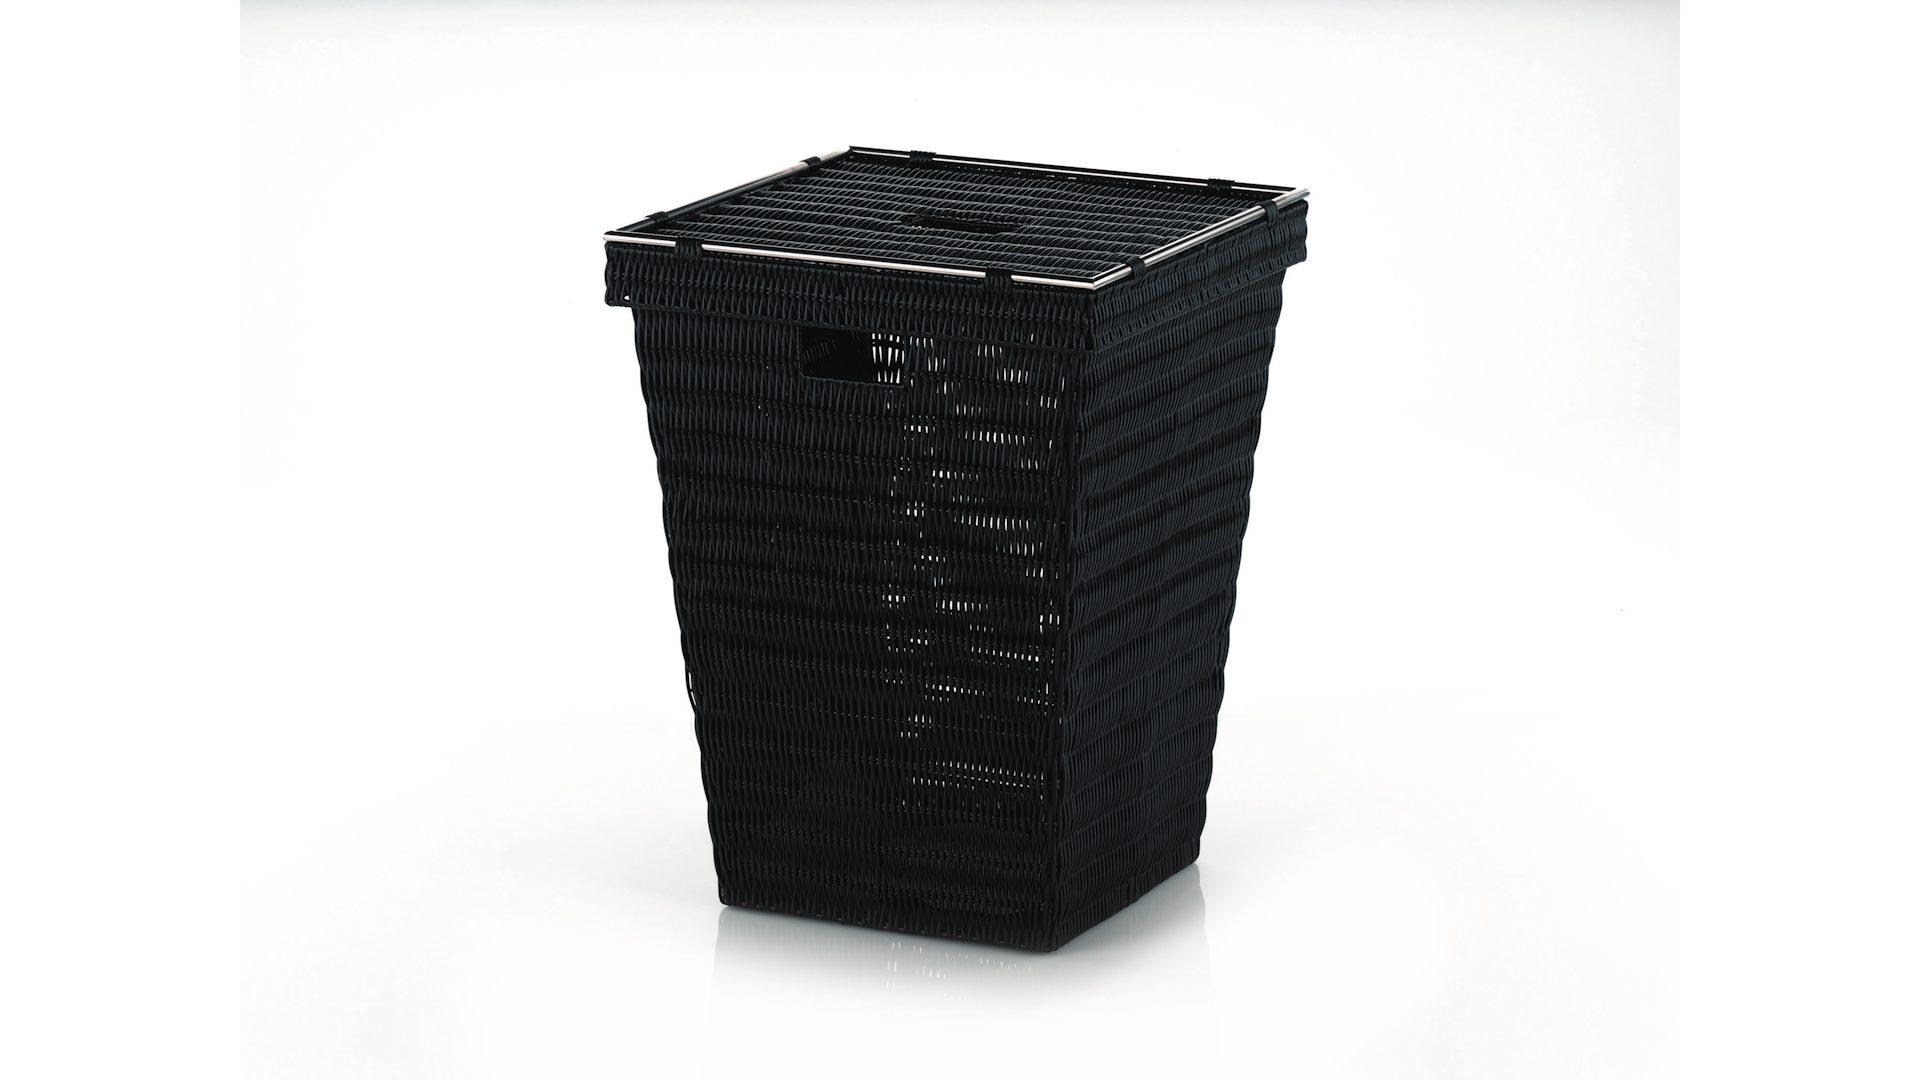 kela Wäschekorb Noblesse, schwarzer Kunststoff – ca. 40 x 53 x 40 cm ...